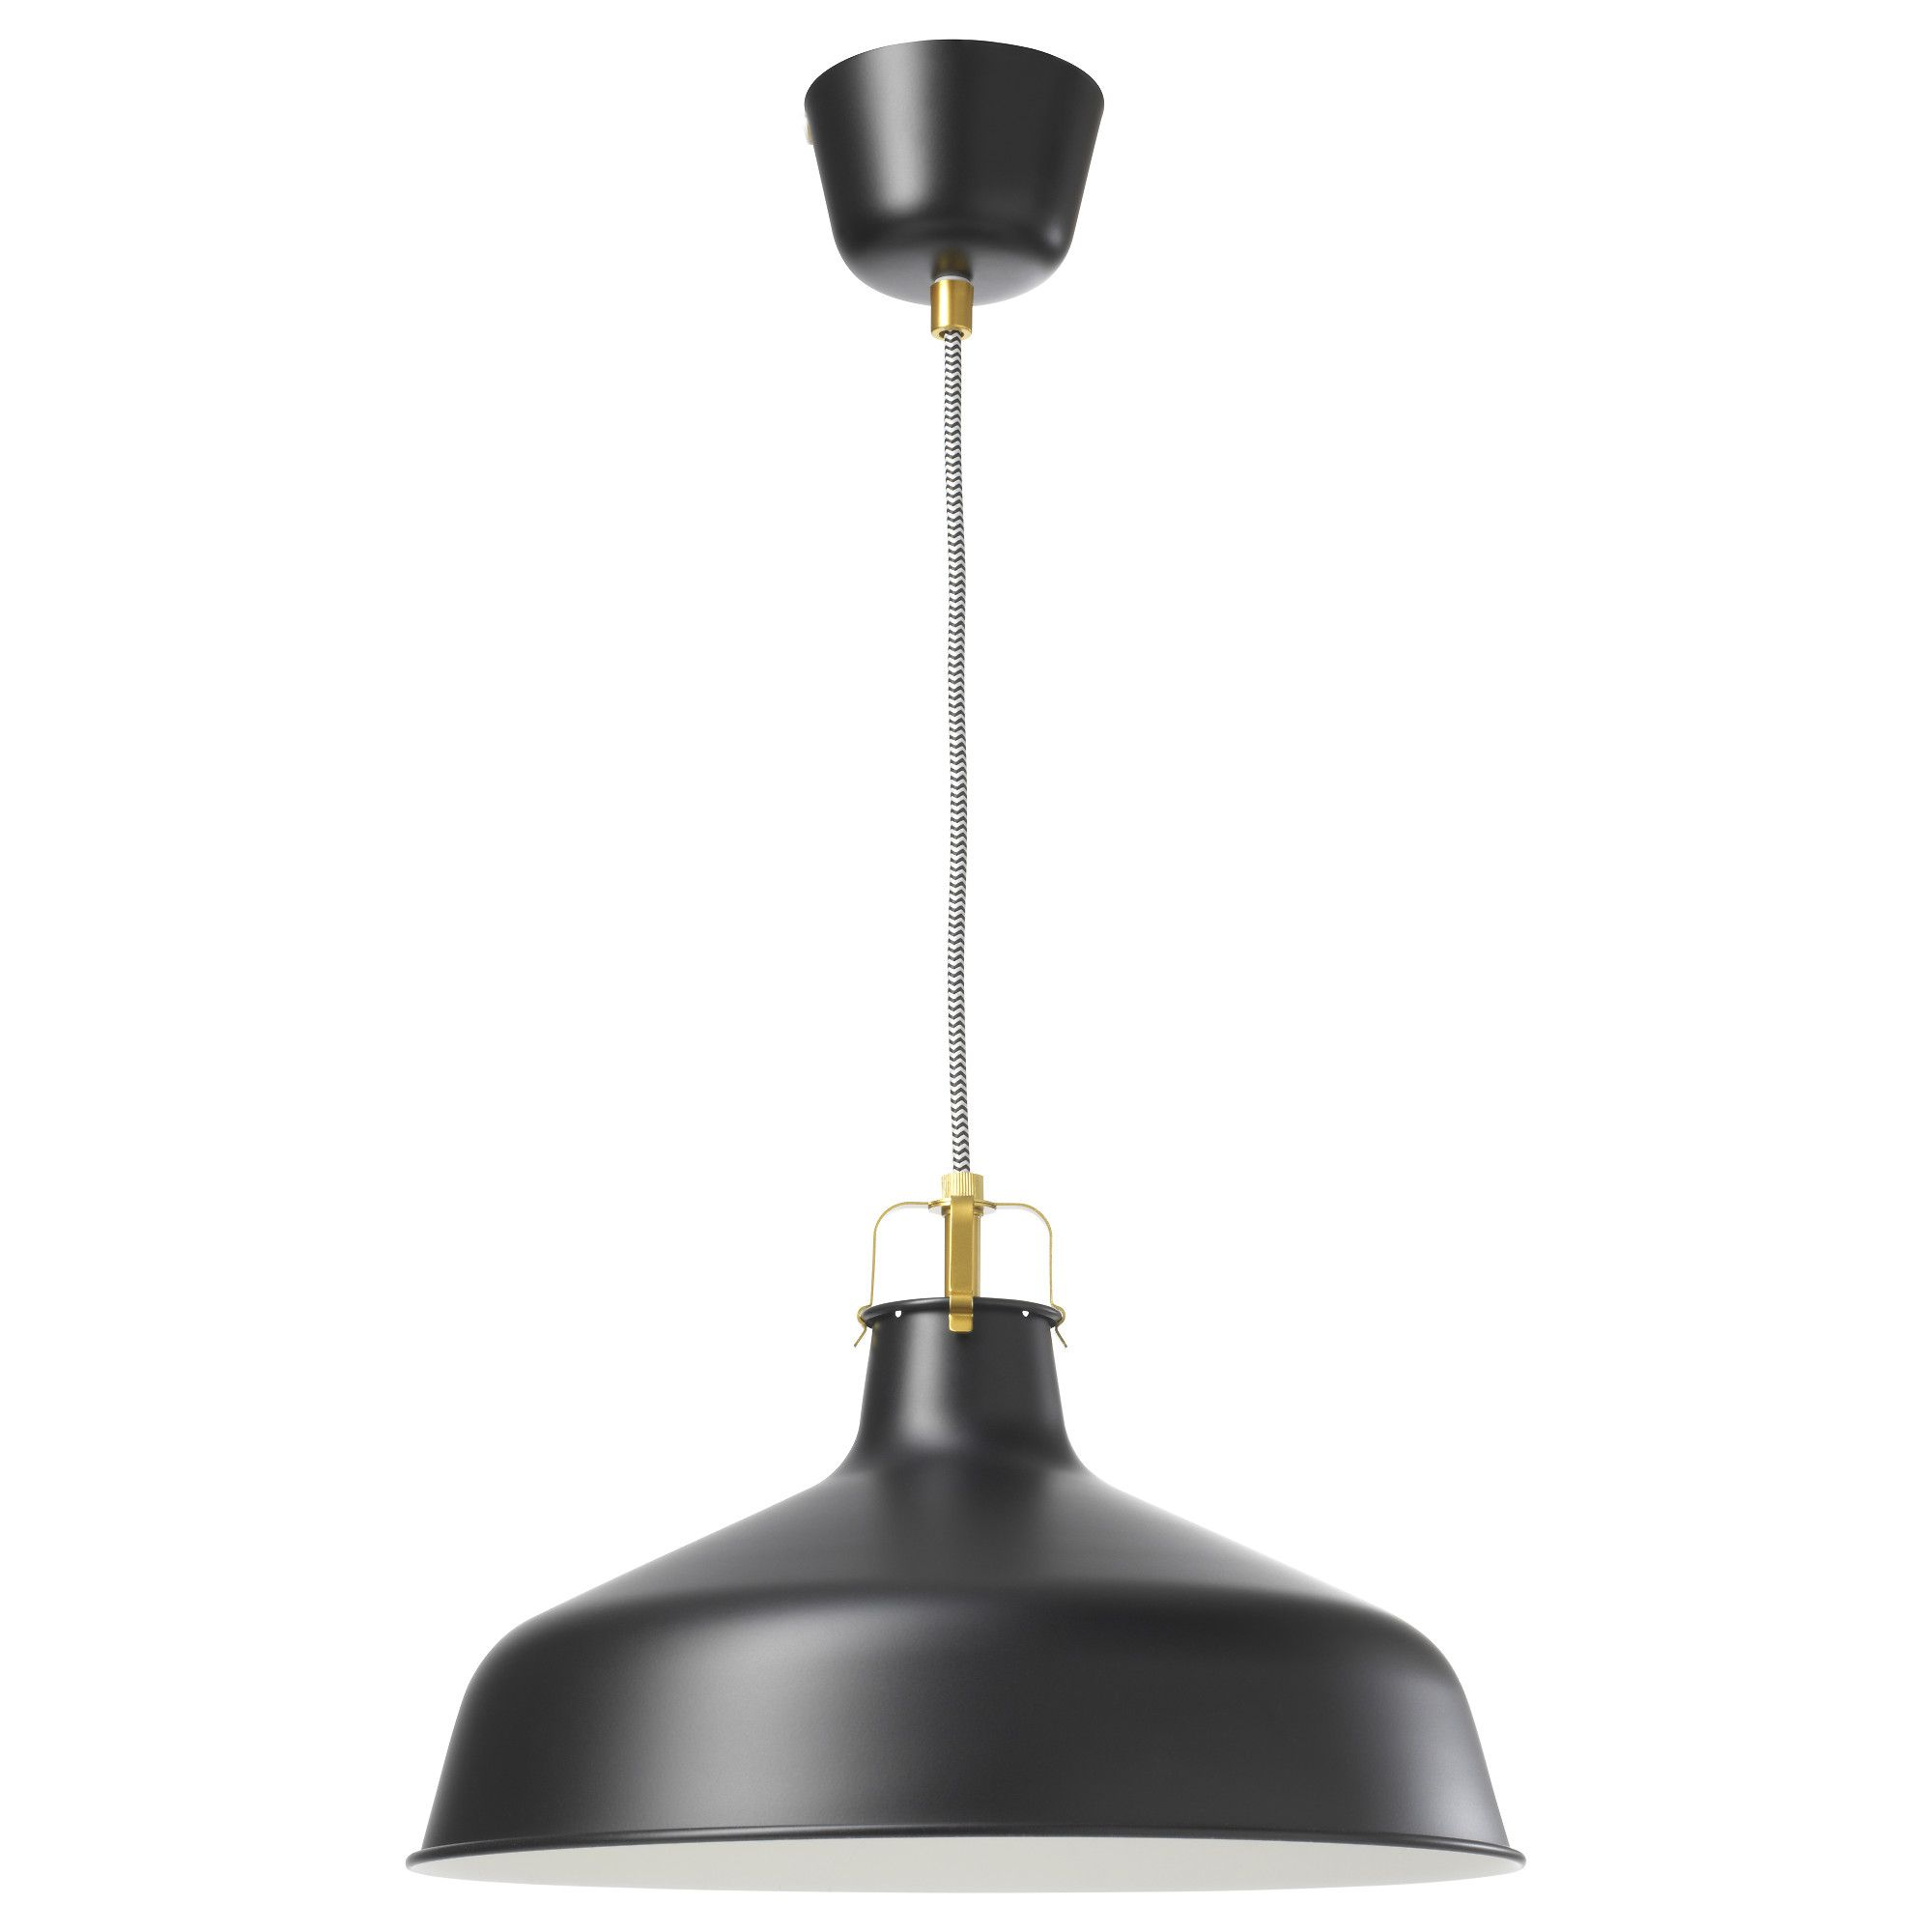 Us Furniture And Home Furnishings Ikea Pendant Light Black Pendant Lamp Ikea Lighting